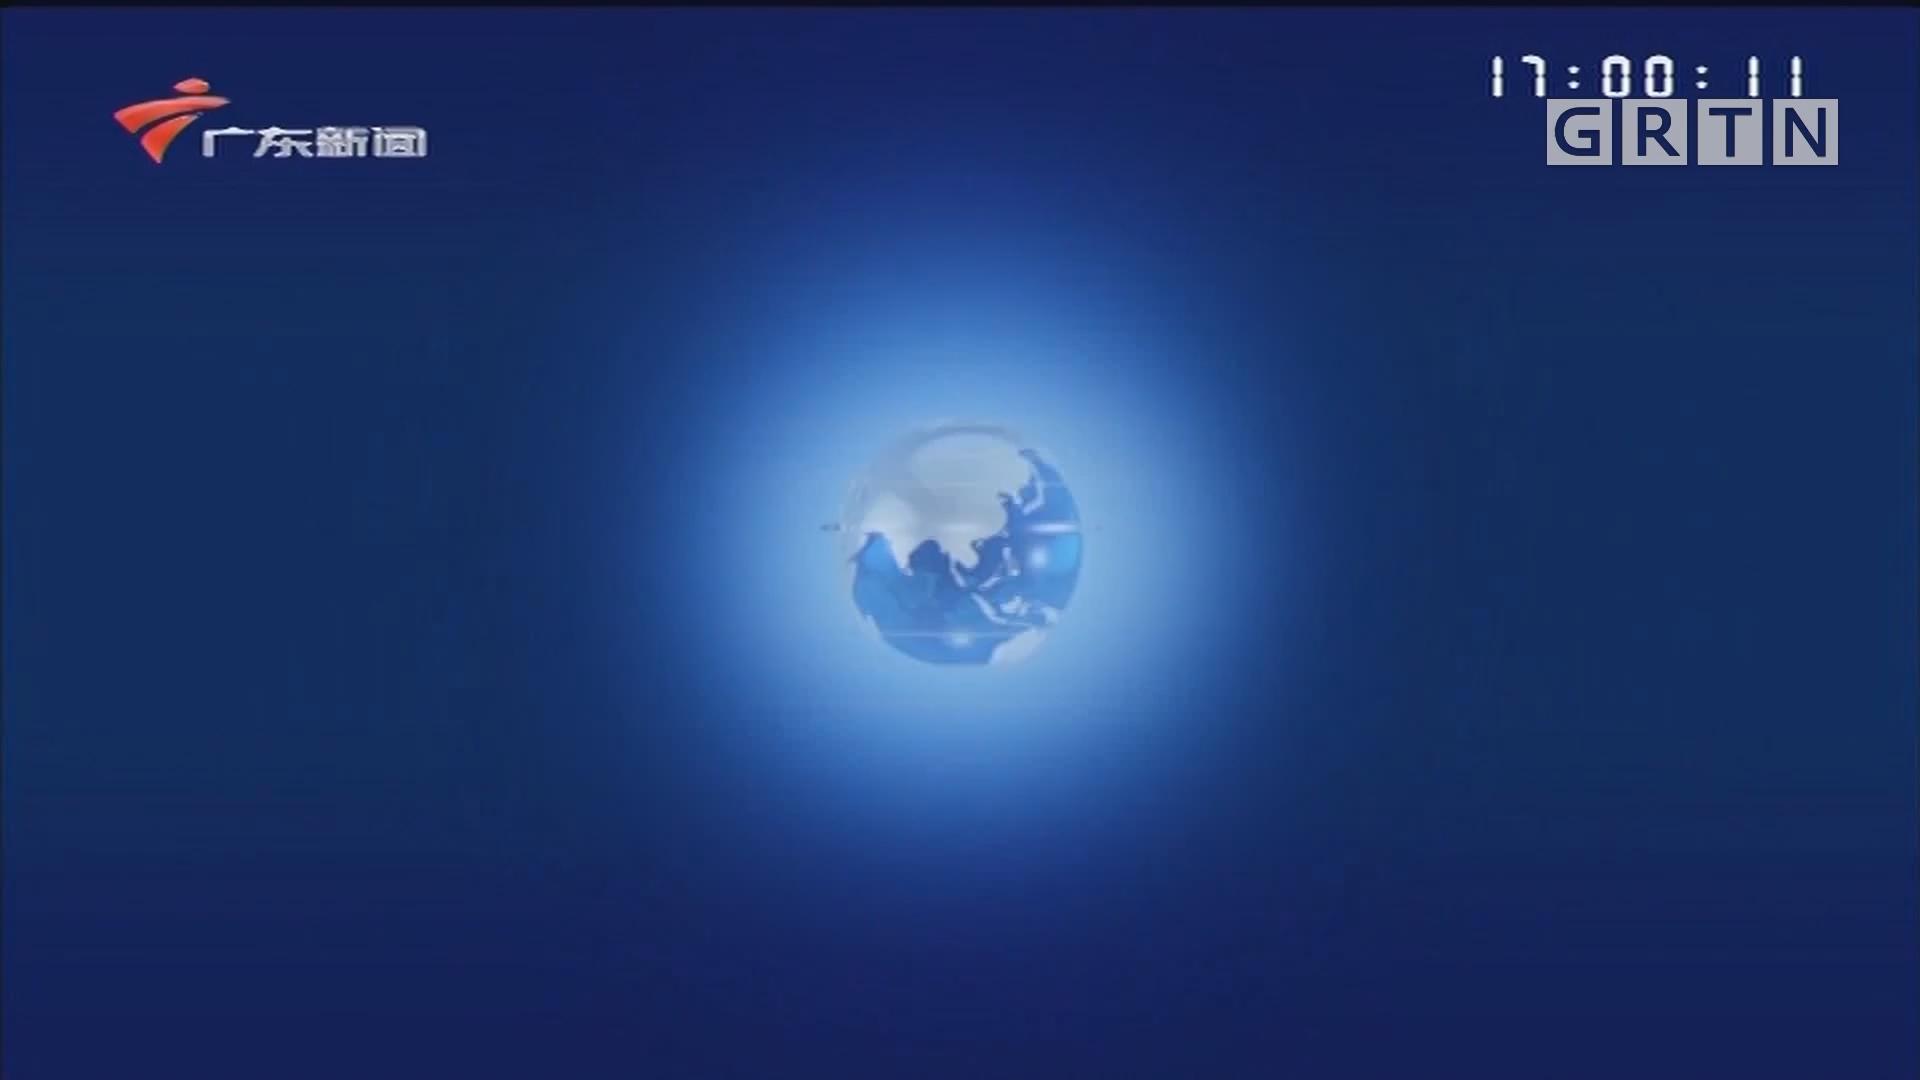 [HD][2020-02-24-17:00]正点播报:广东 企业复工复产防控检查不放松